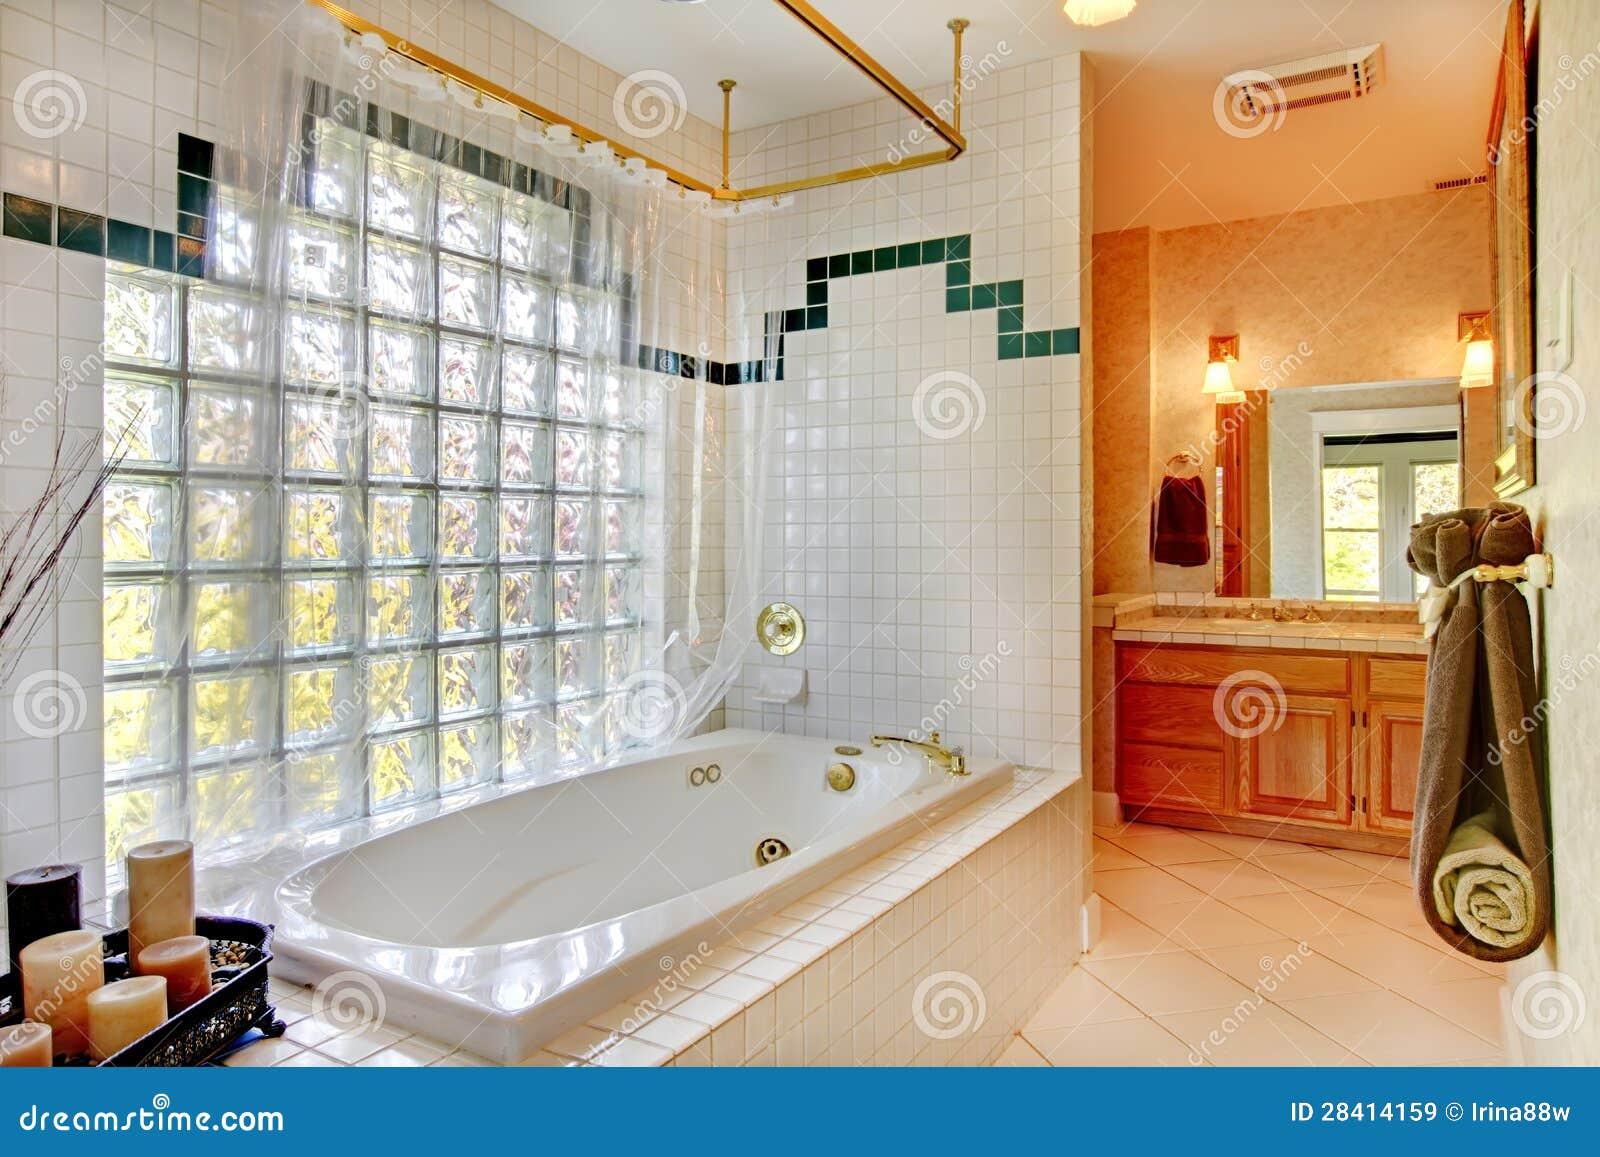 Vasche Da Bagno In Vetro Prezzi : Vasca da bagno vintage fucsia